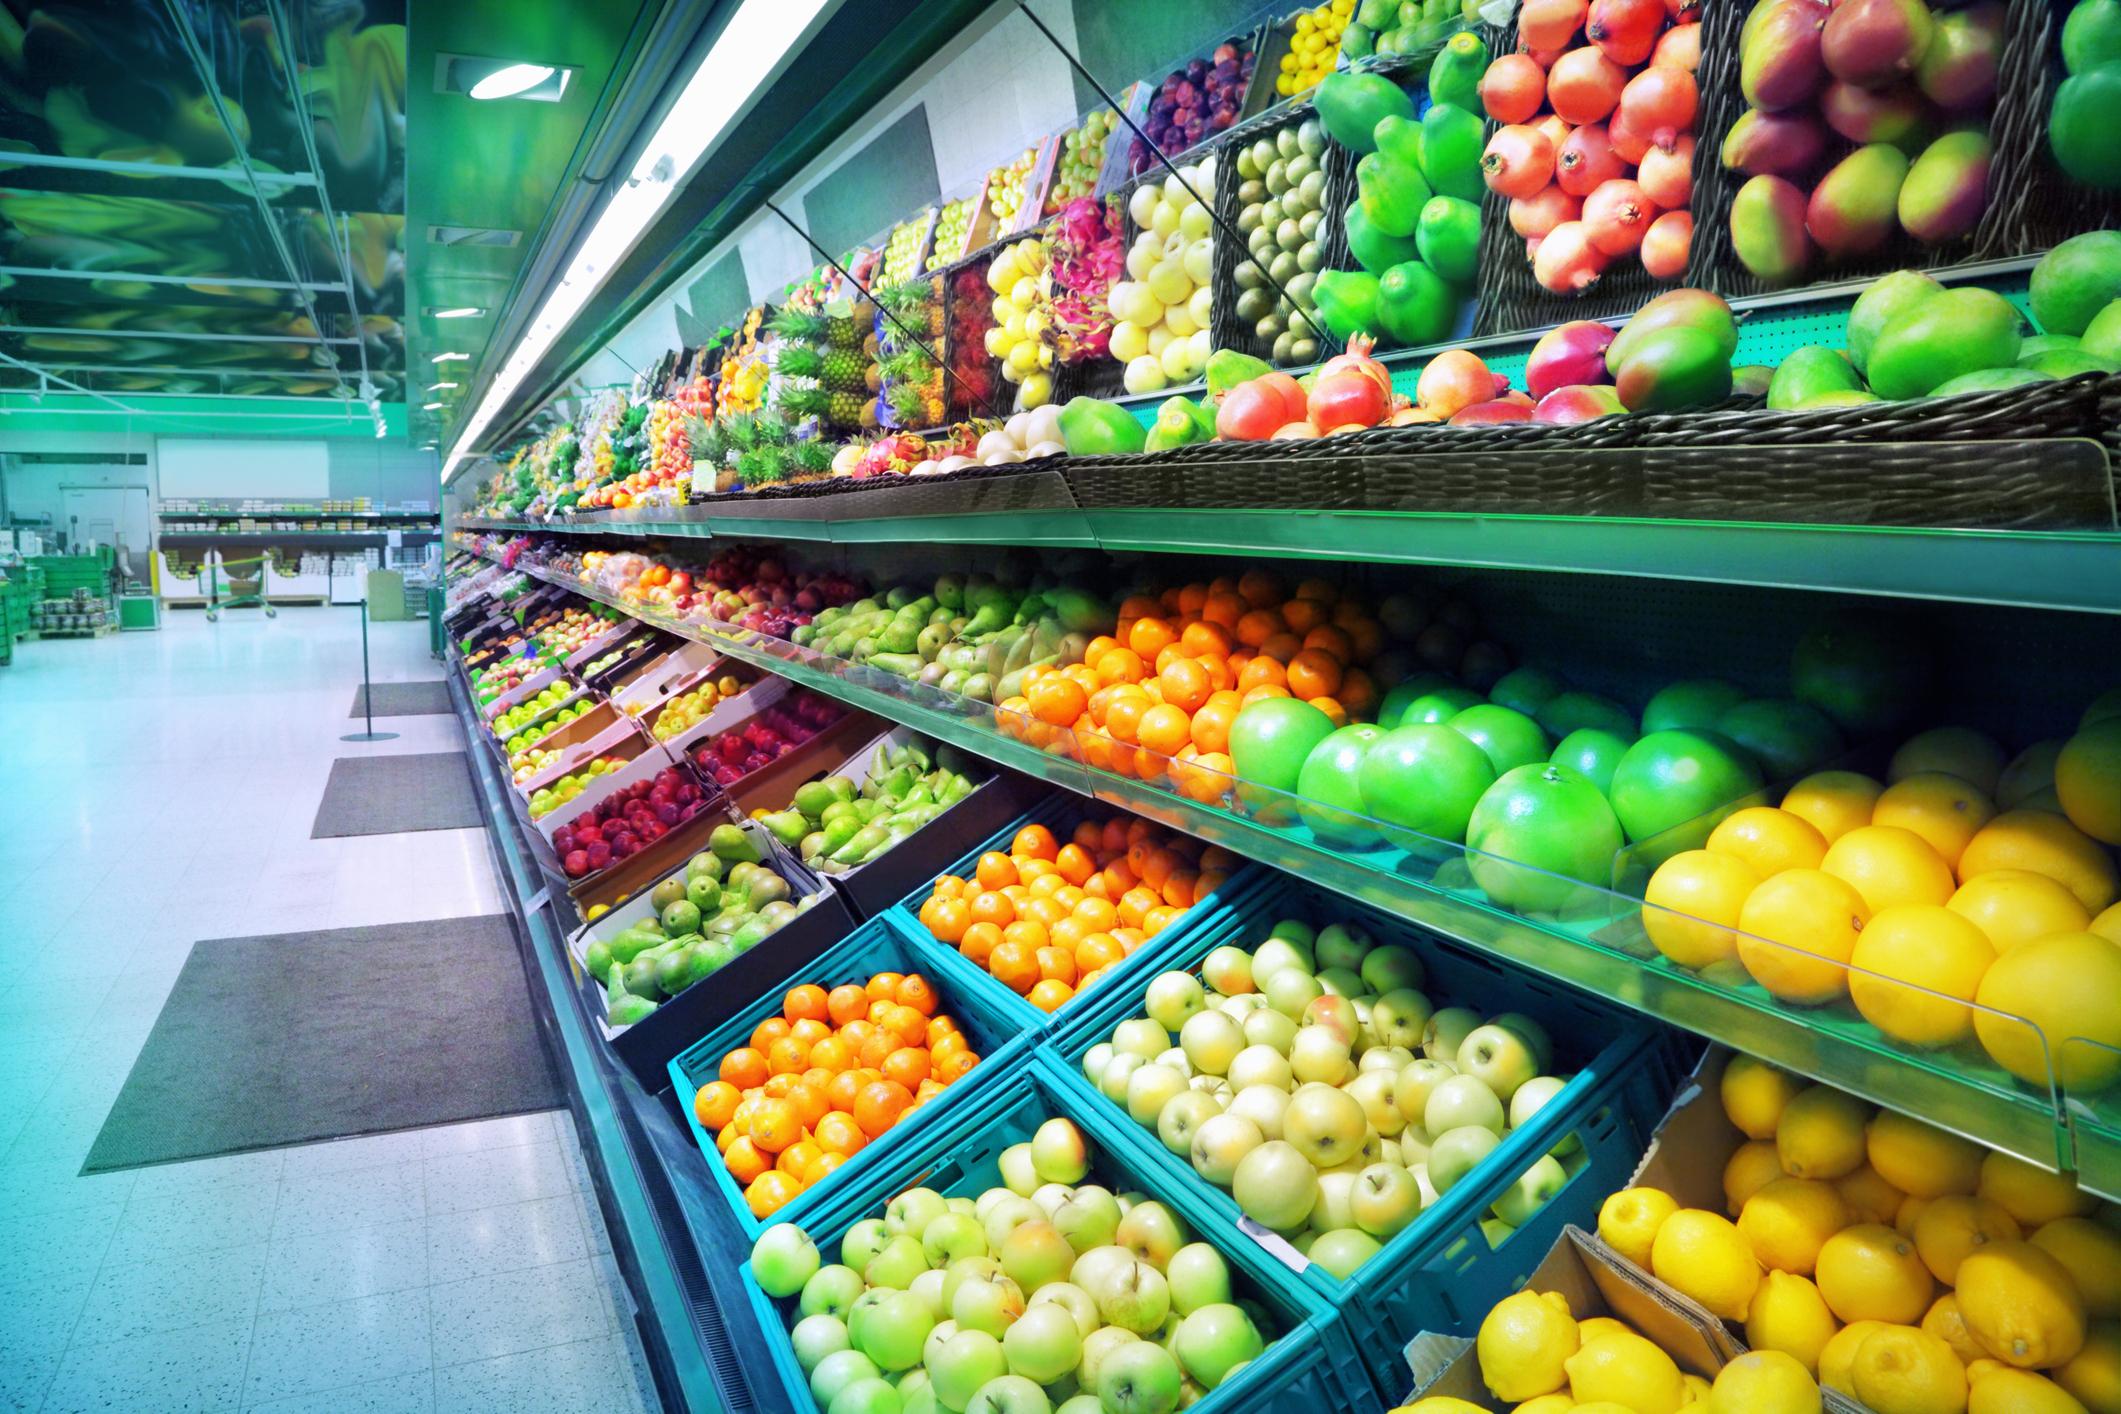 Supermarket produce department